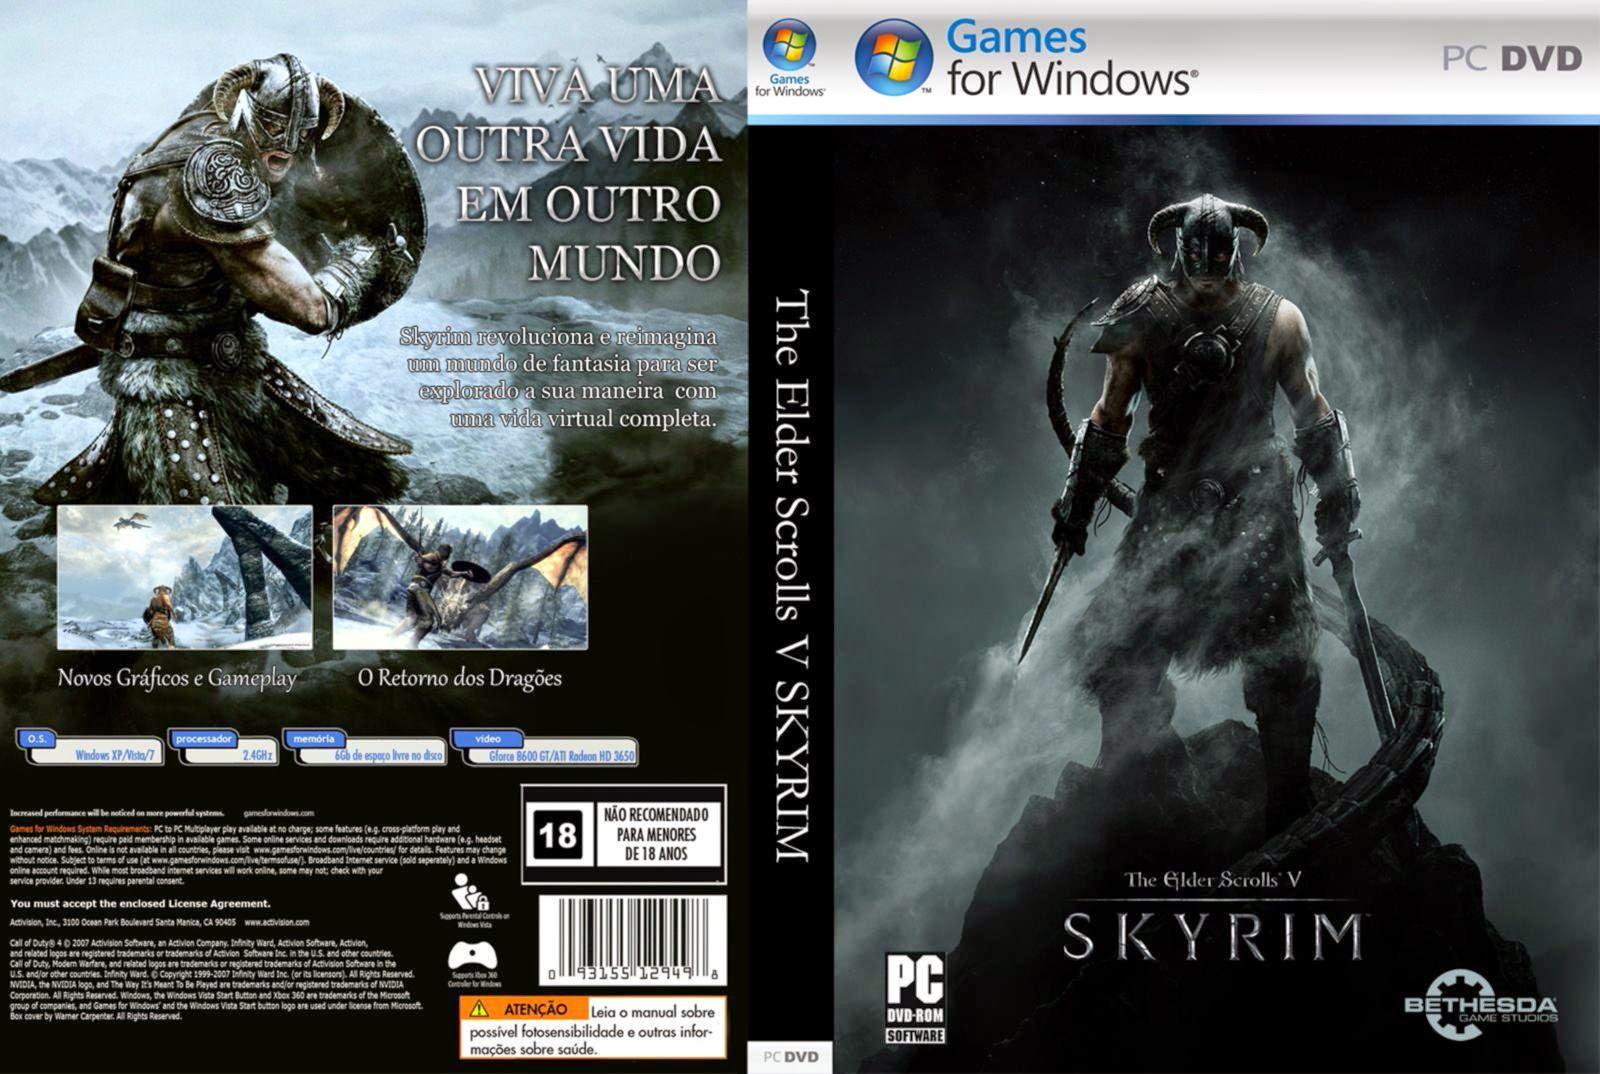 Elder Scrolls V Skyrim Gold Edition imagens